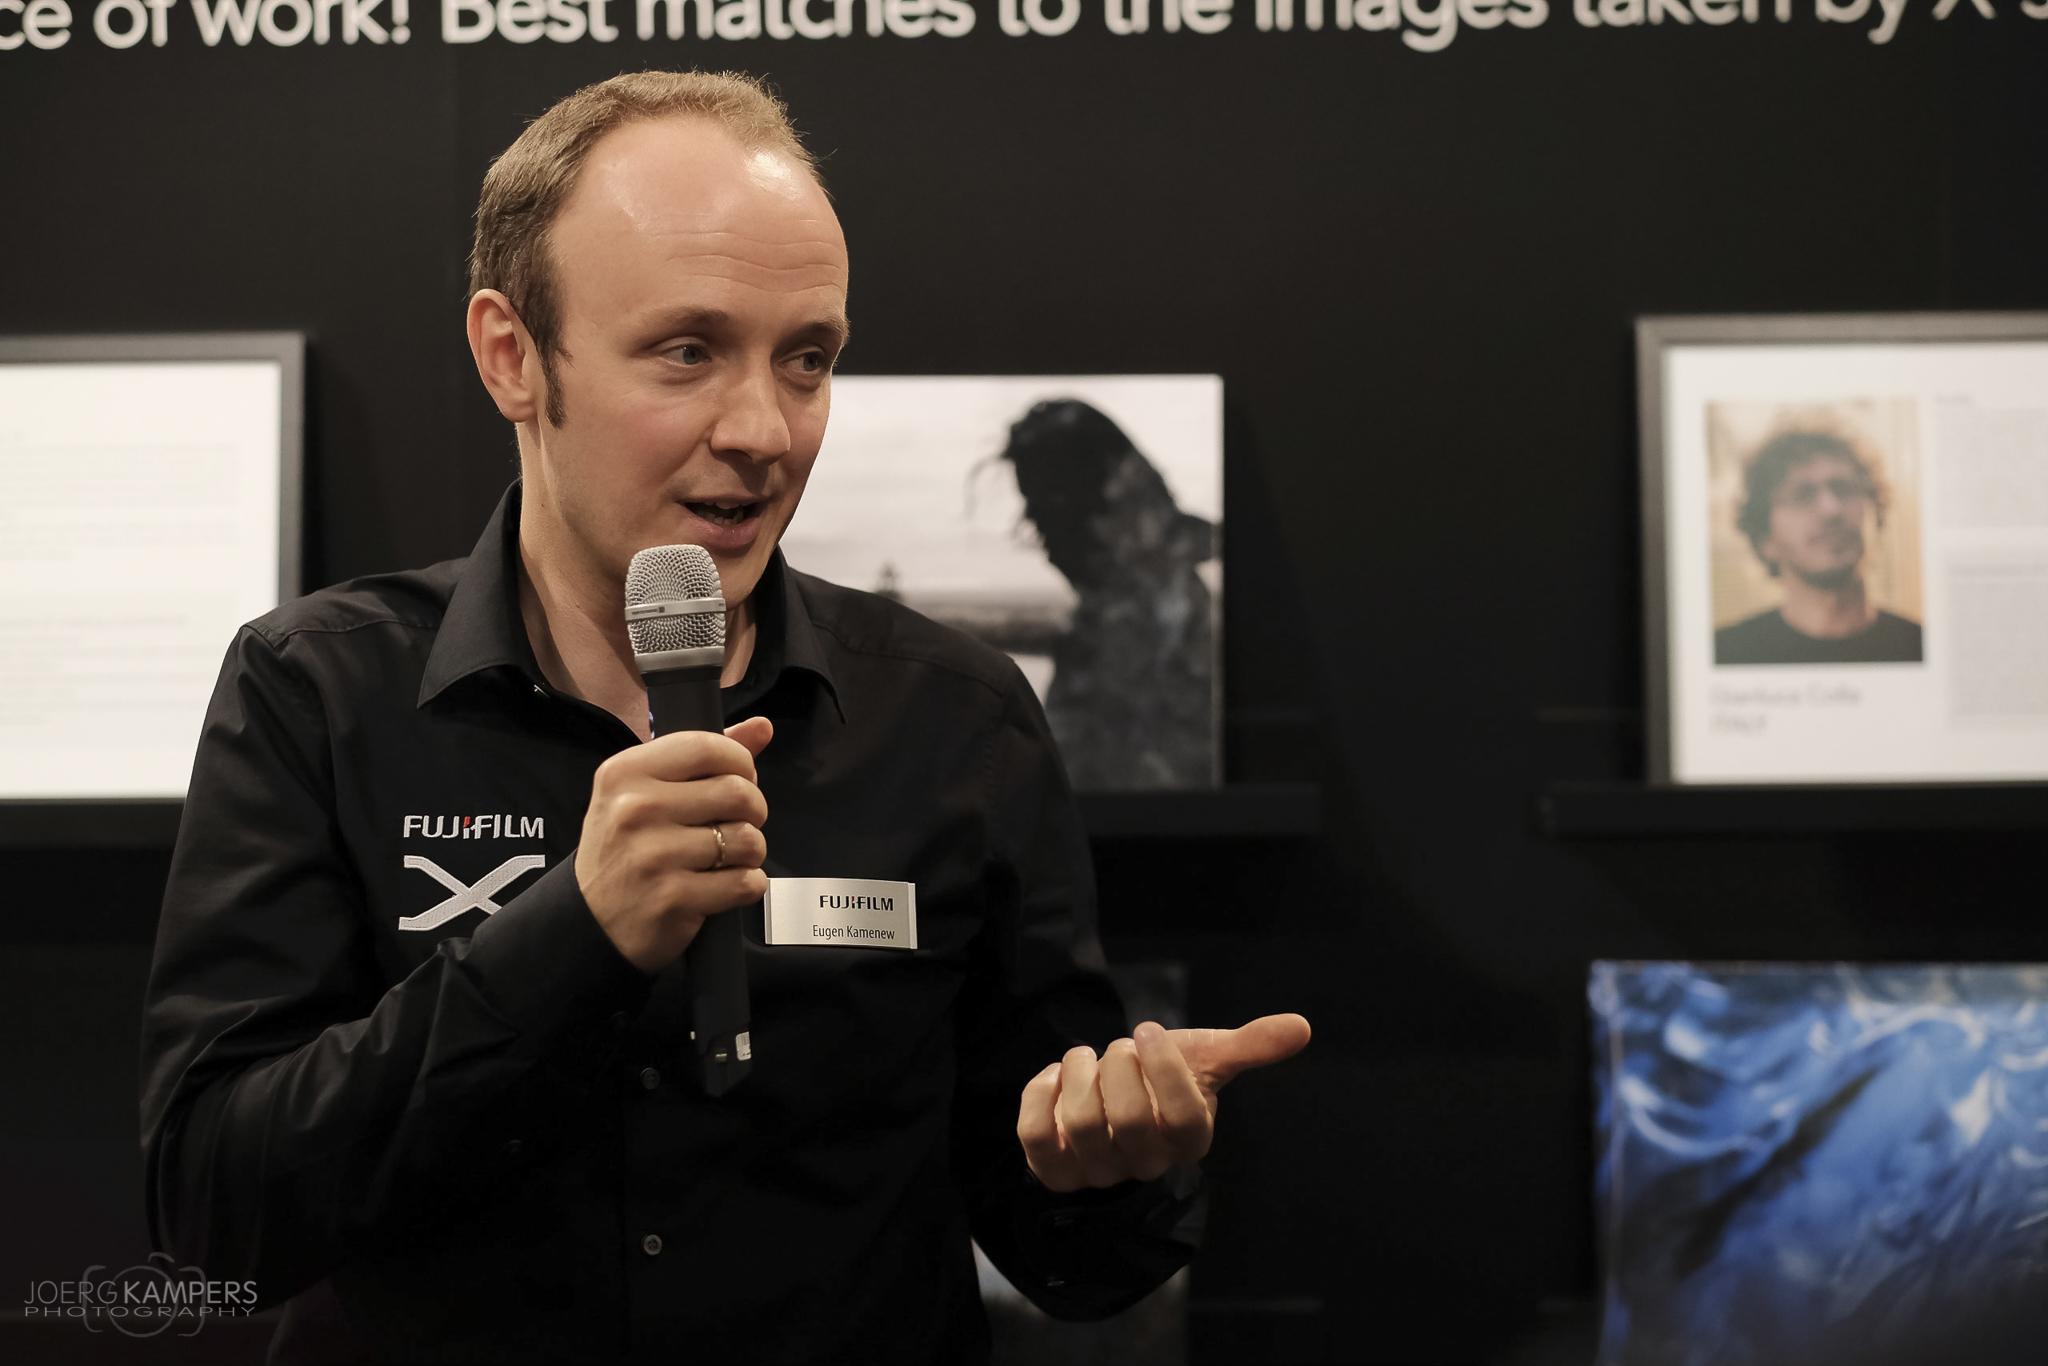 Eugen Kamenew (official Fujifilm X-Photographer) at Photokina 2016 giving a public speech